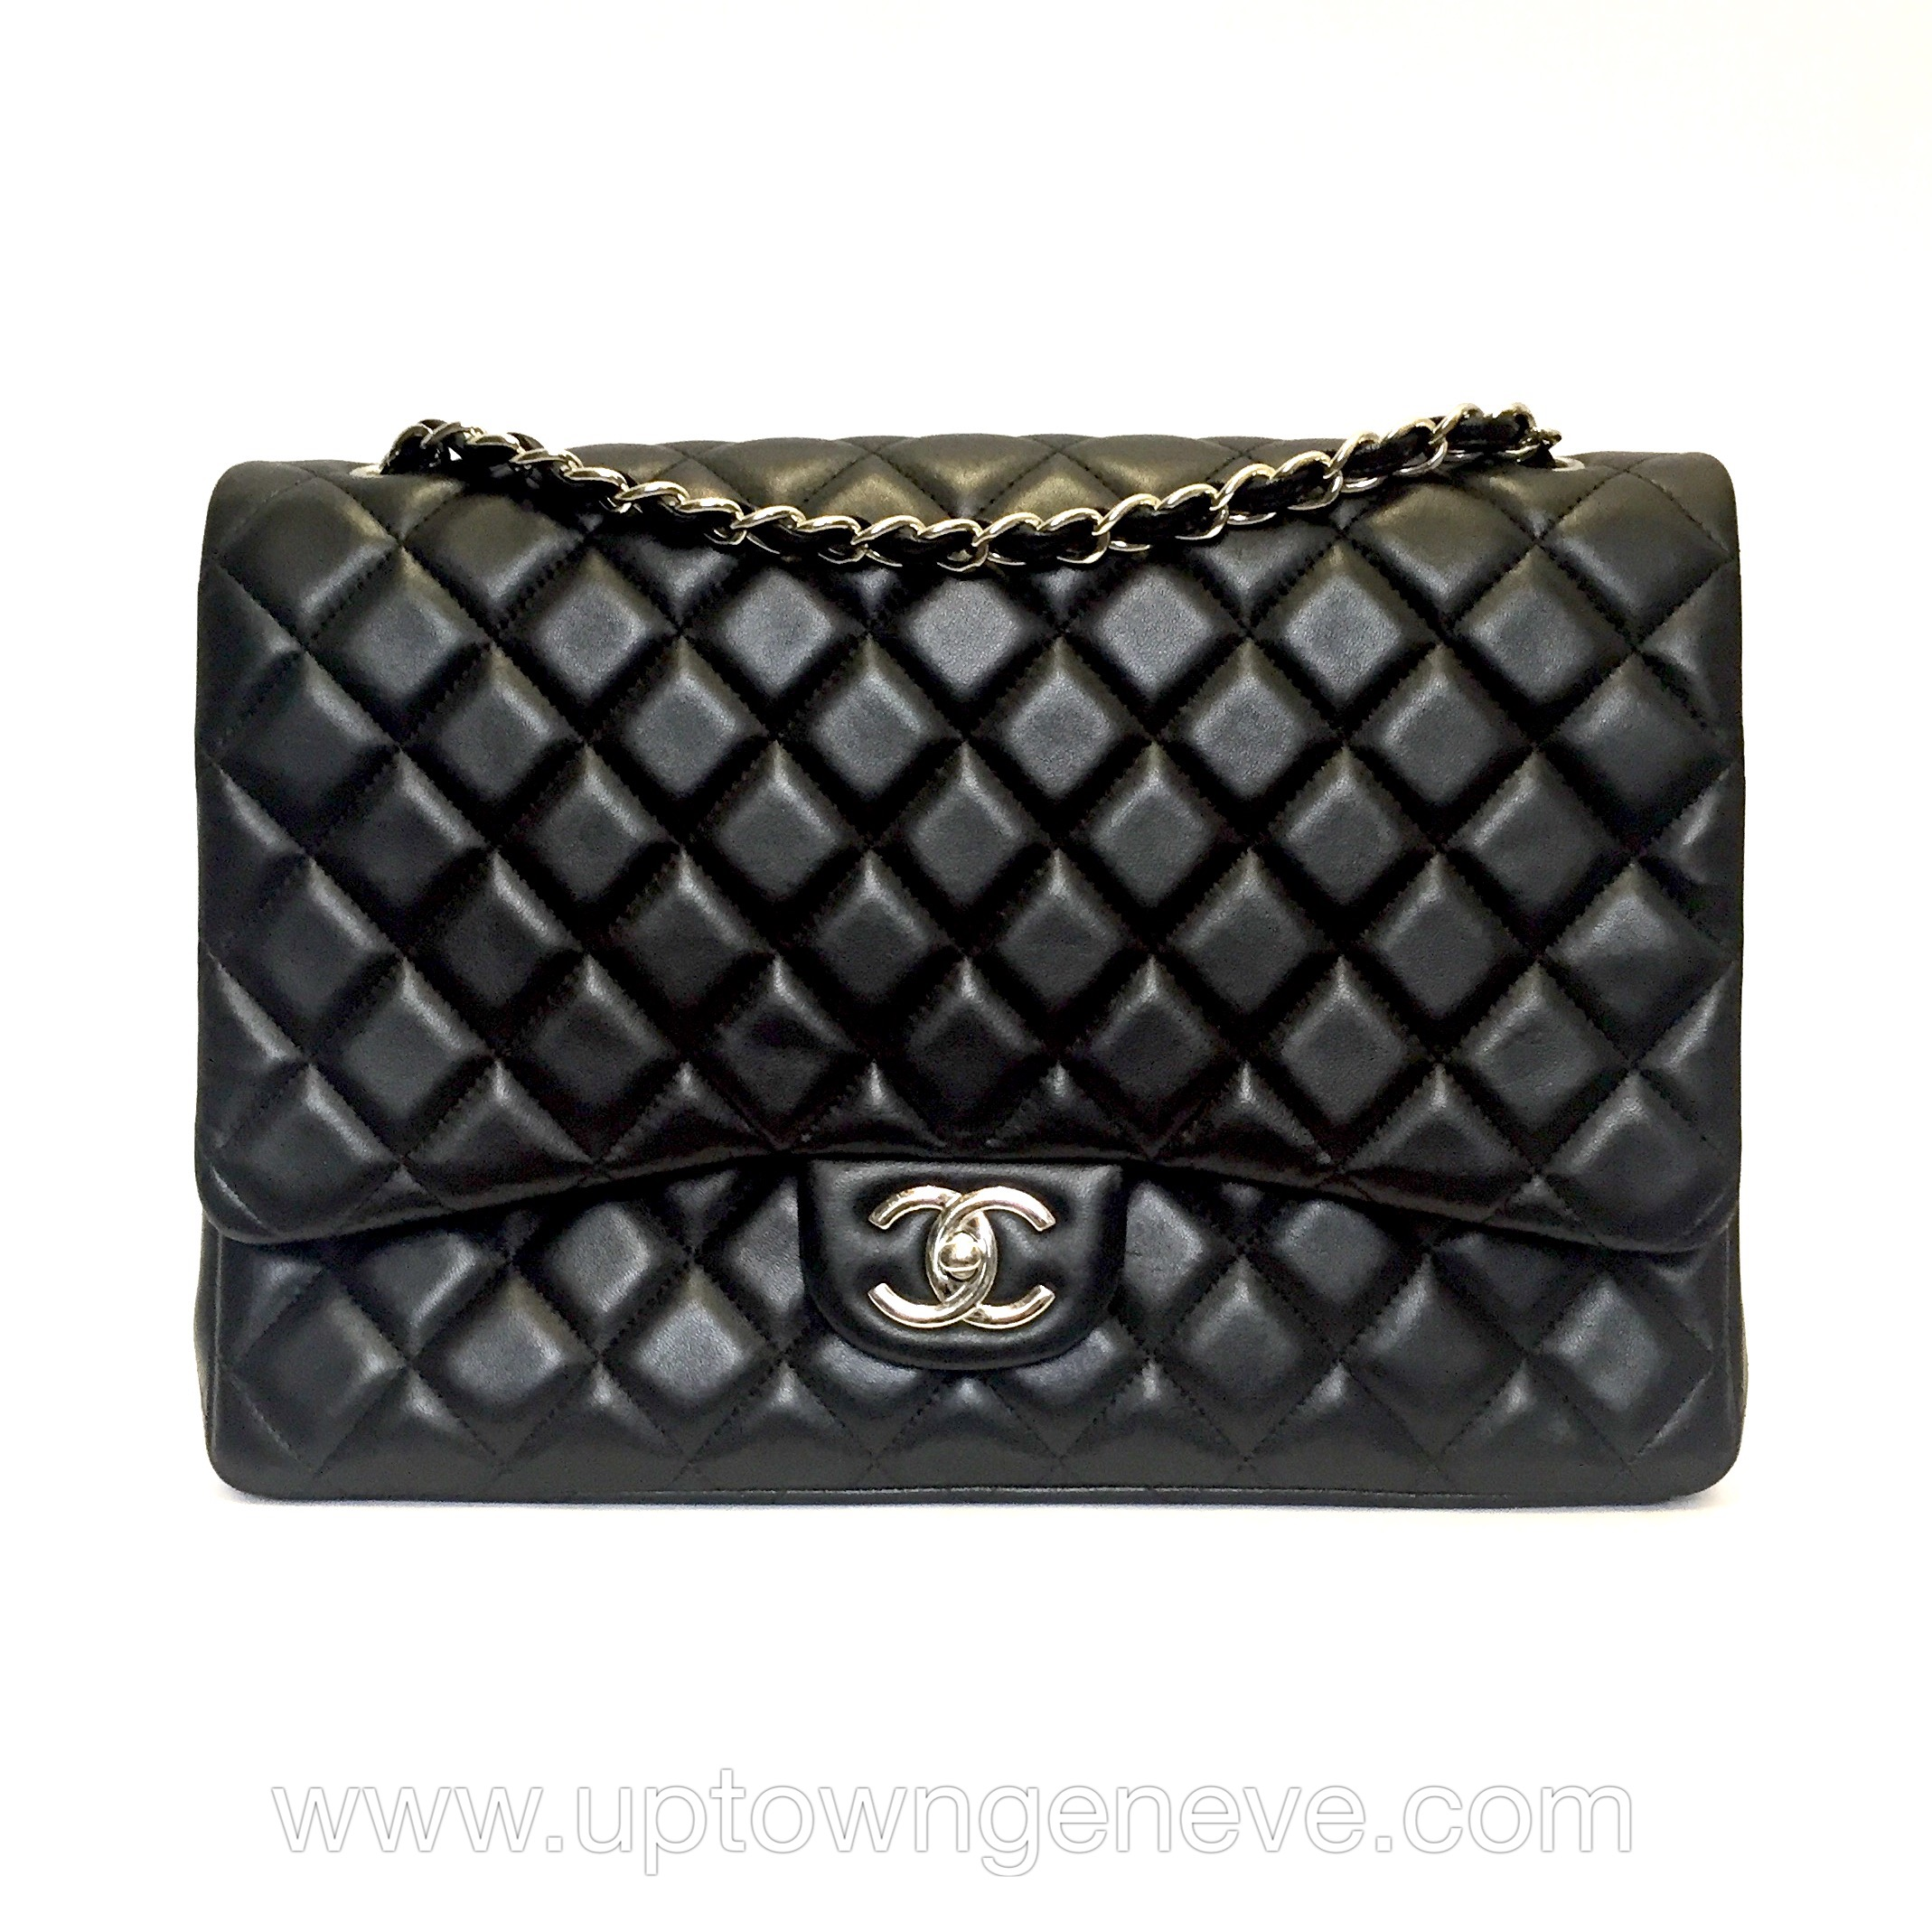 a5a89ccb Chanel Classic Maxi bag in black lambskin